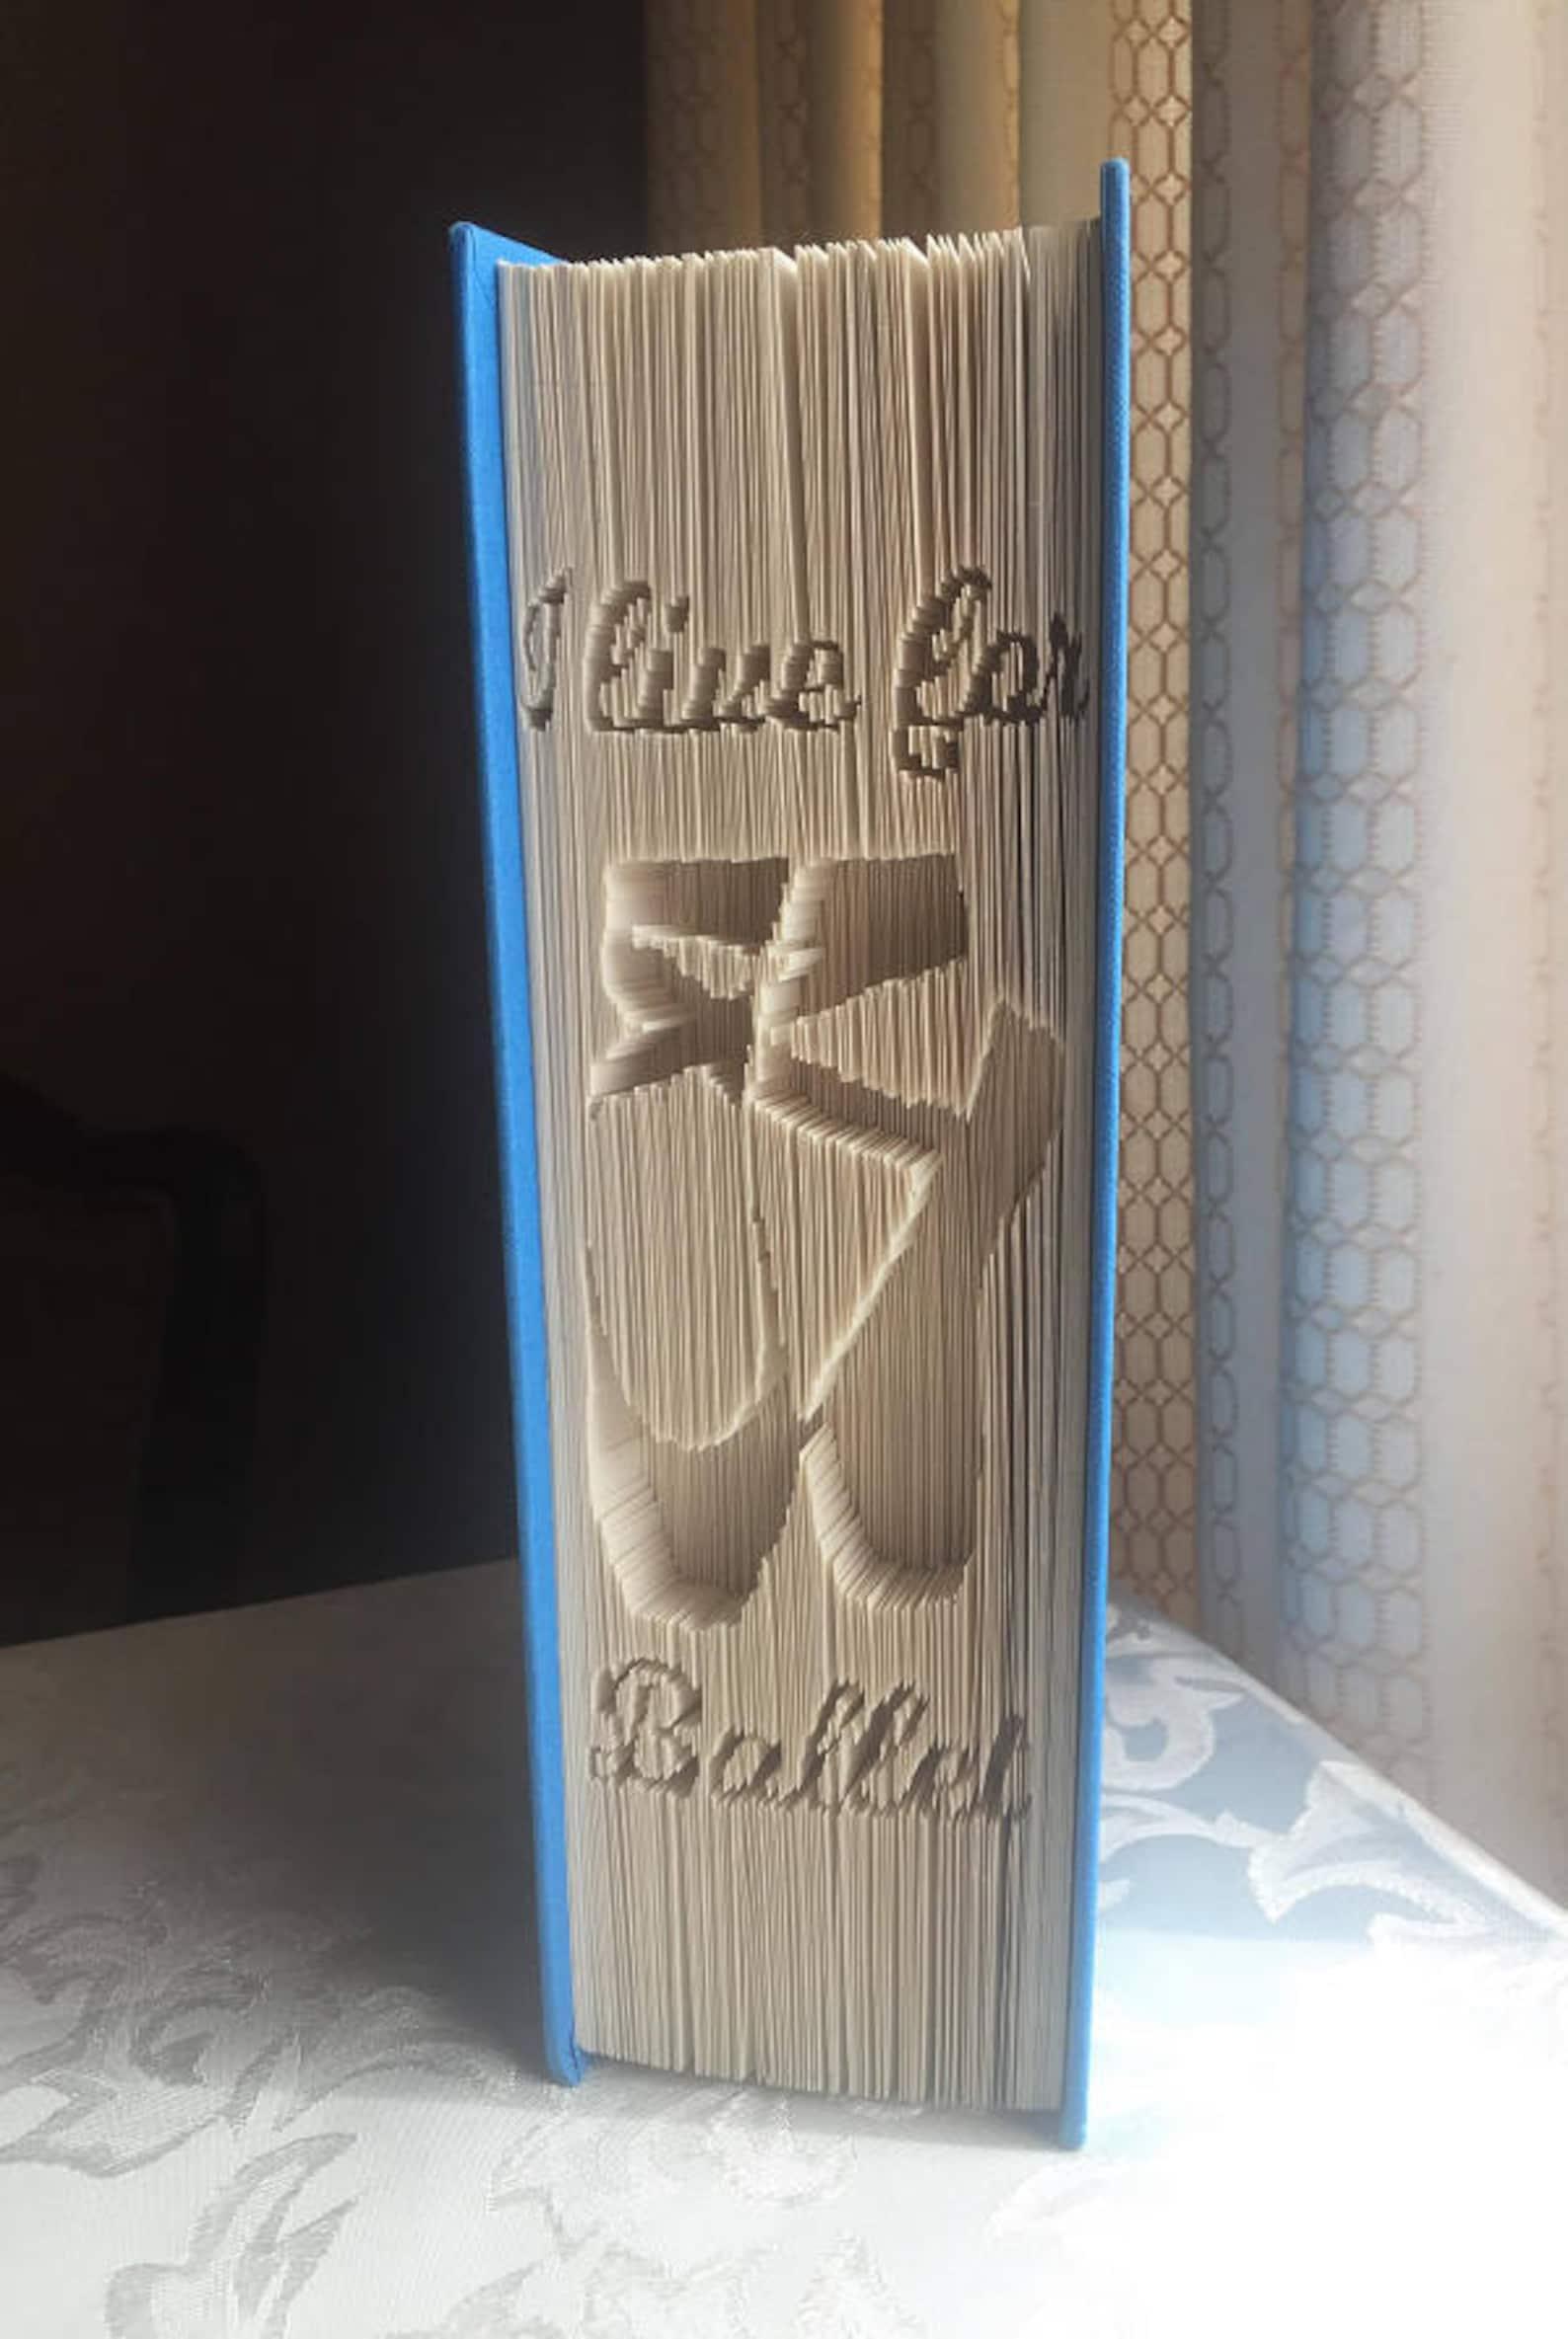 i live for ballet, ballet shoes cut & fold book folding pattern (digital download pattern only)